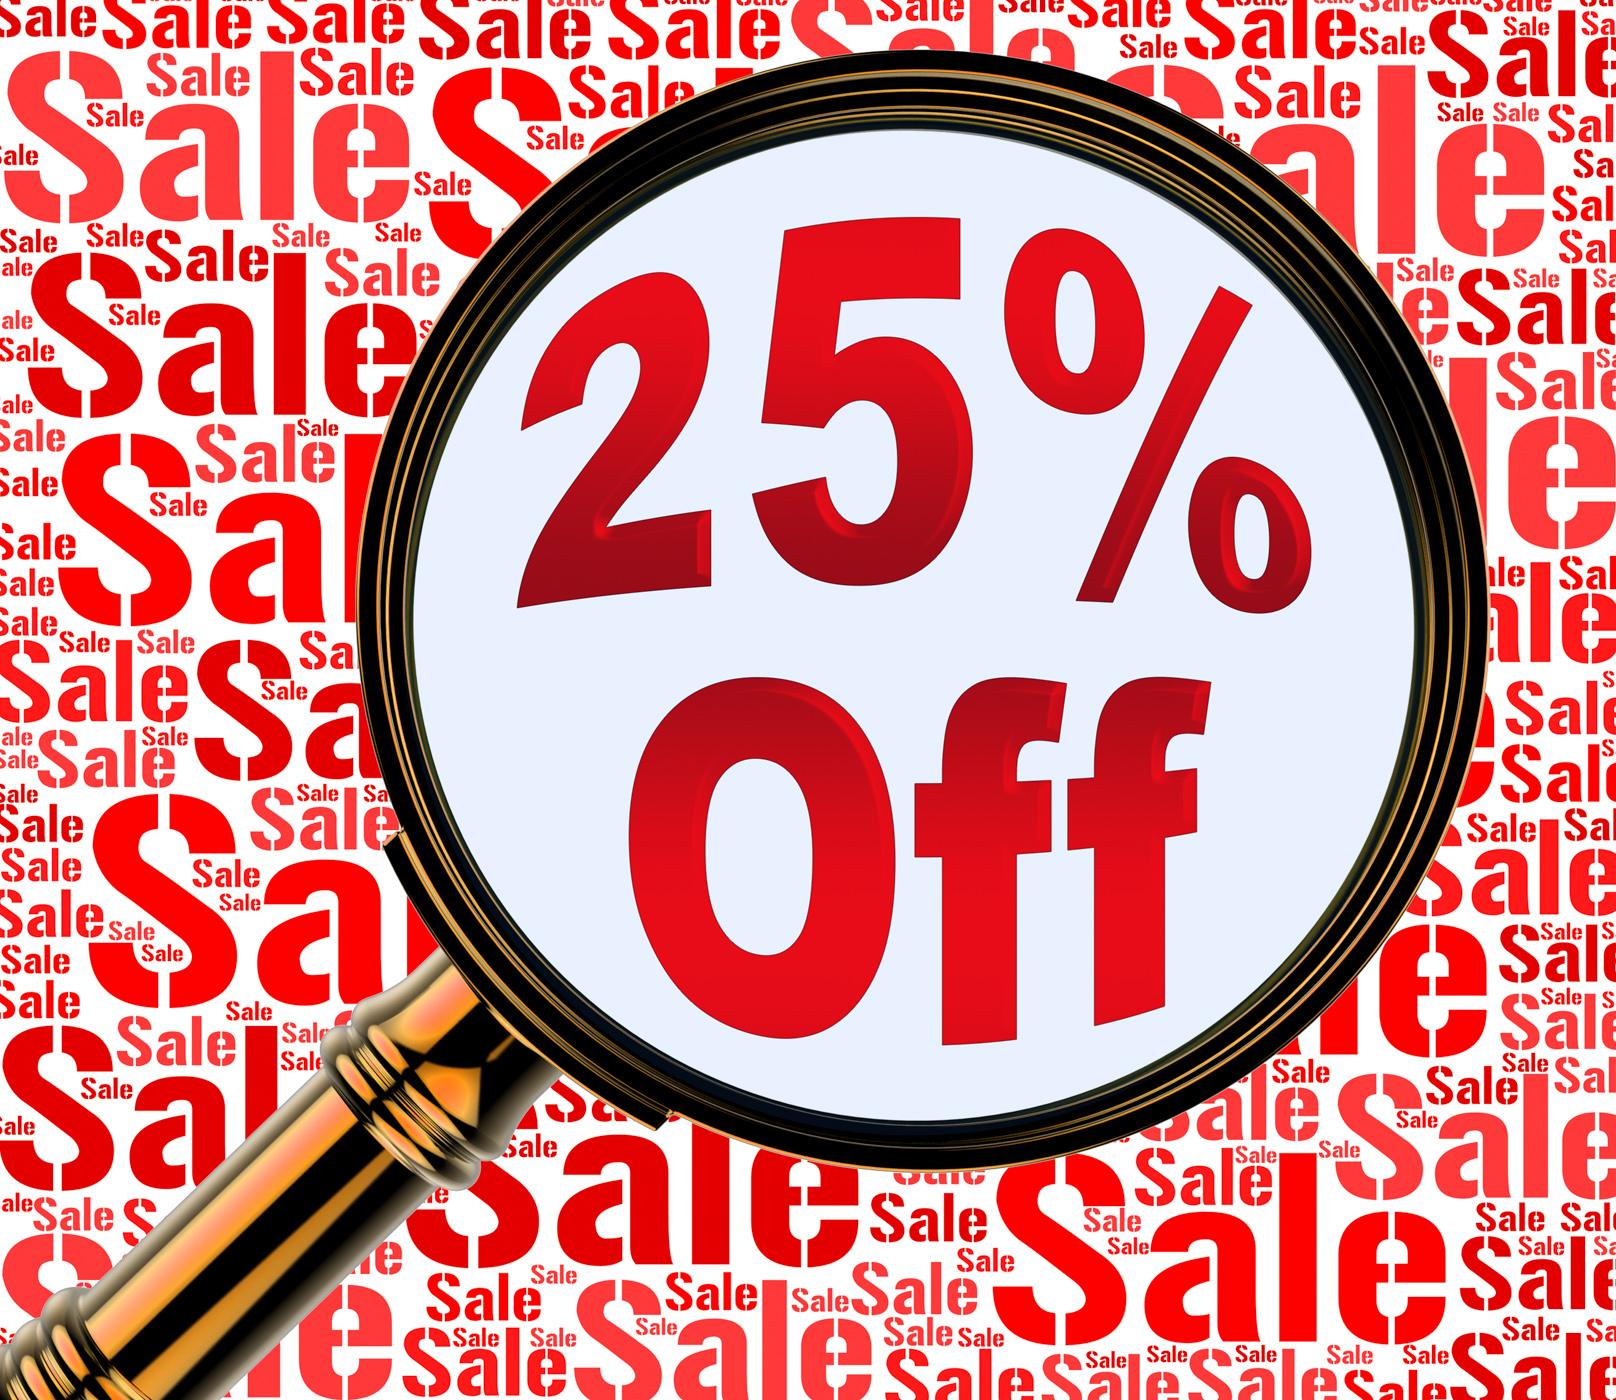 Twenty five percent off shows 25 discount 3d rendering photo